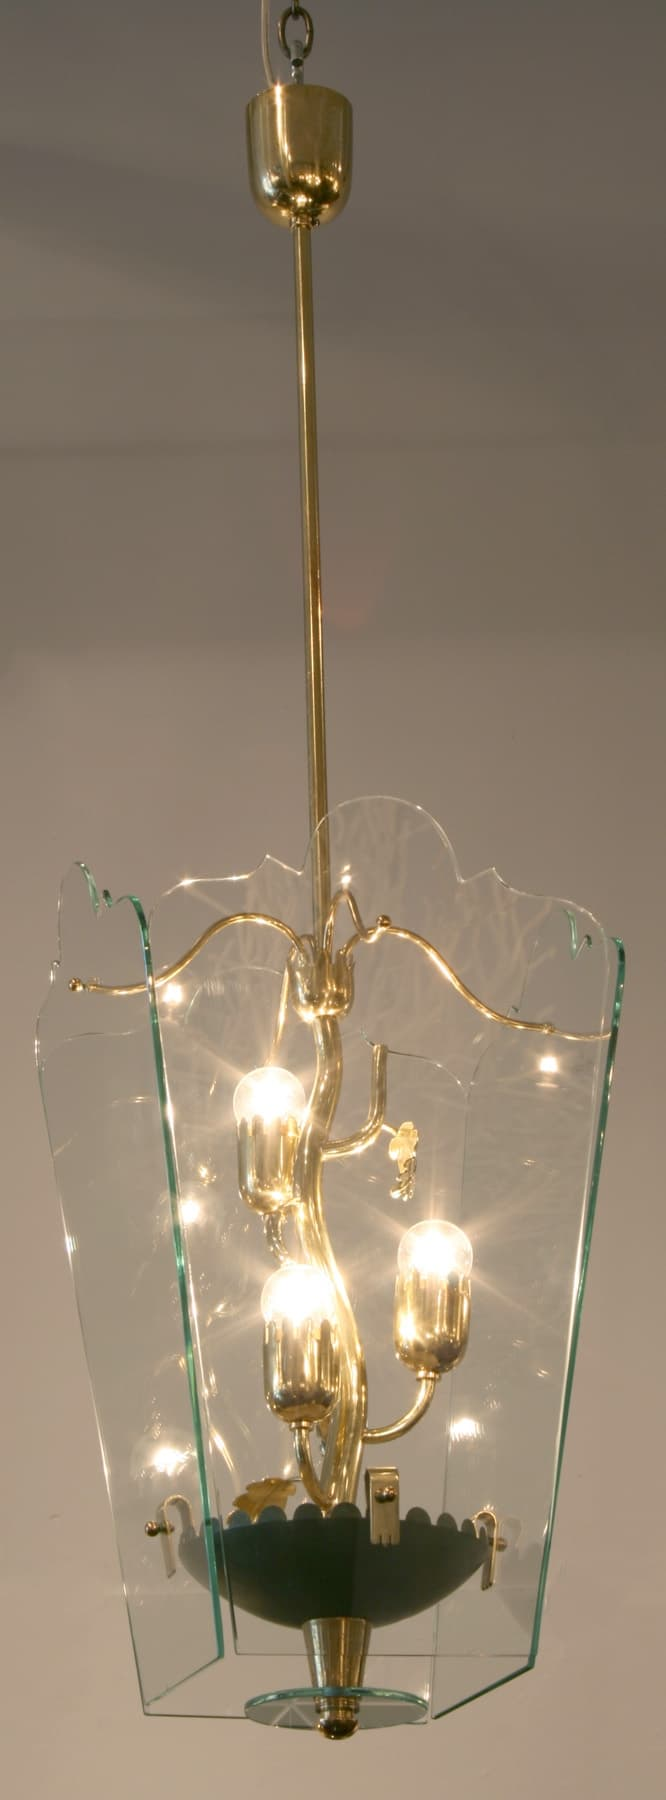 pietro chiesa for fontana arte chandelier todd merrill. Black Bedroom Furniture Sets. Home Design Ideas